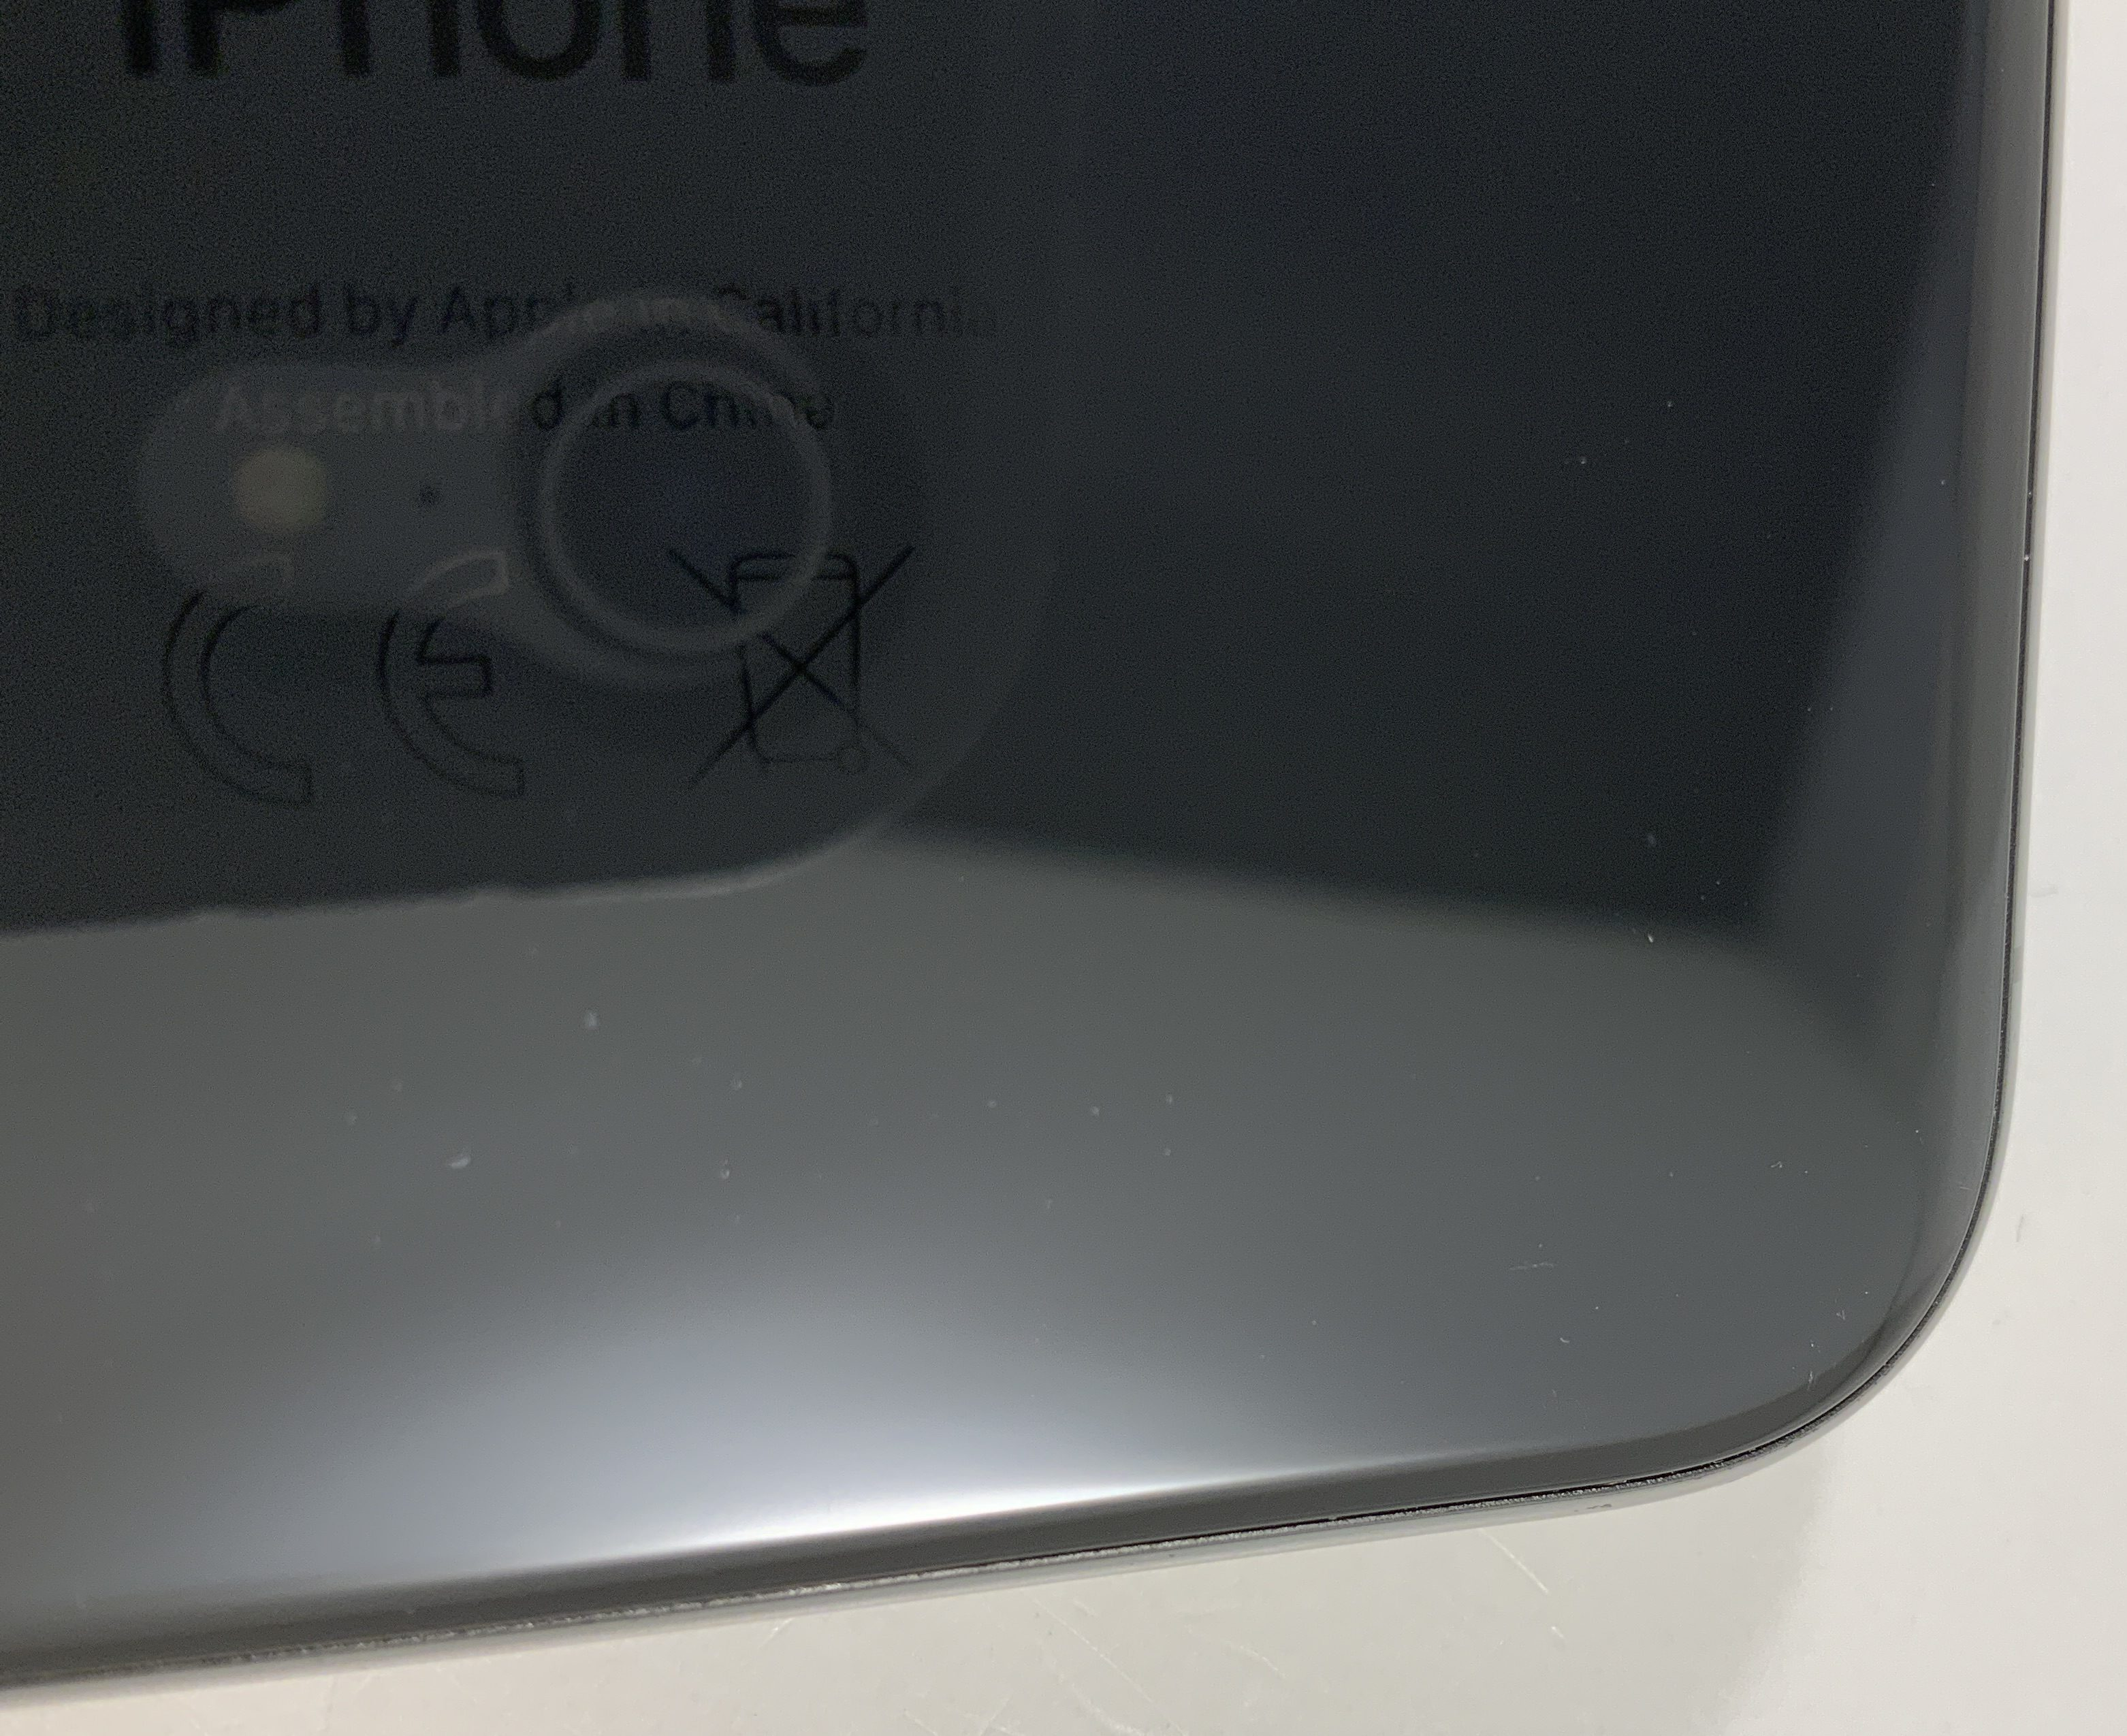 iPhone X 64GB, 64GB, Space Gray, immagine 3